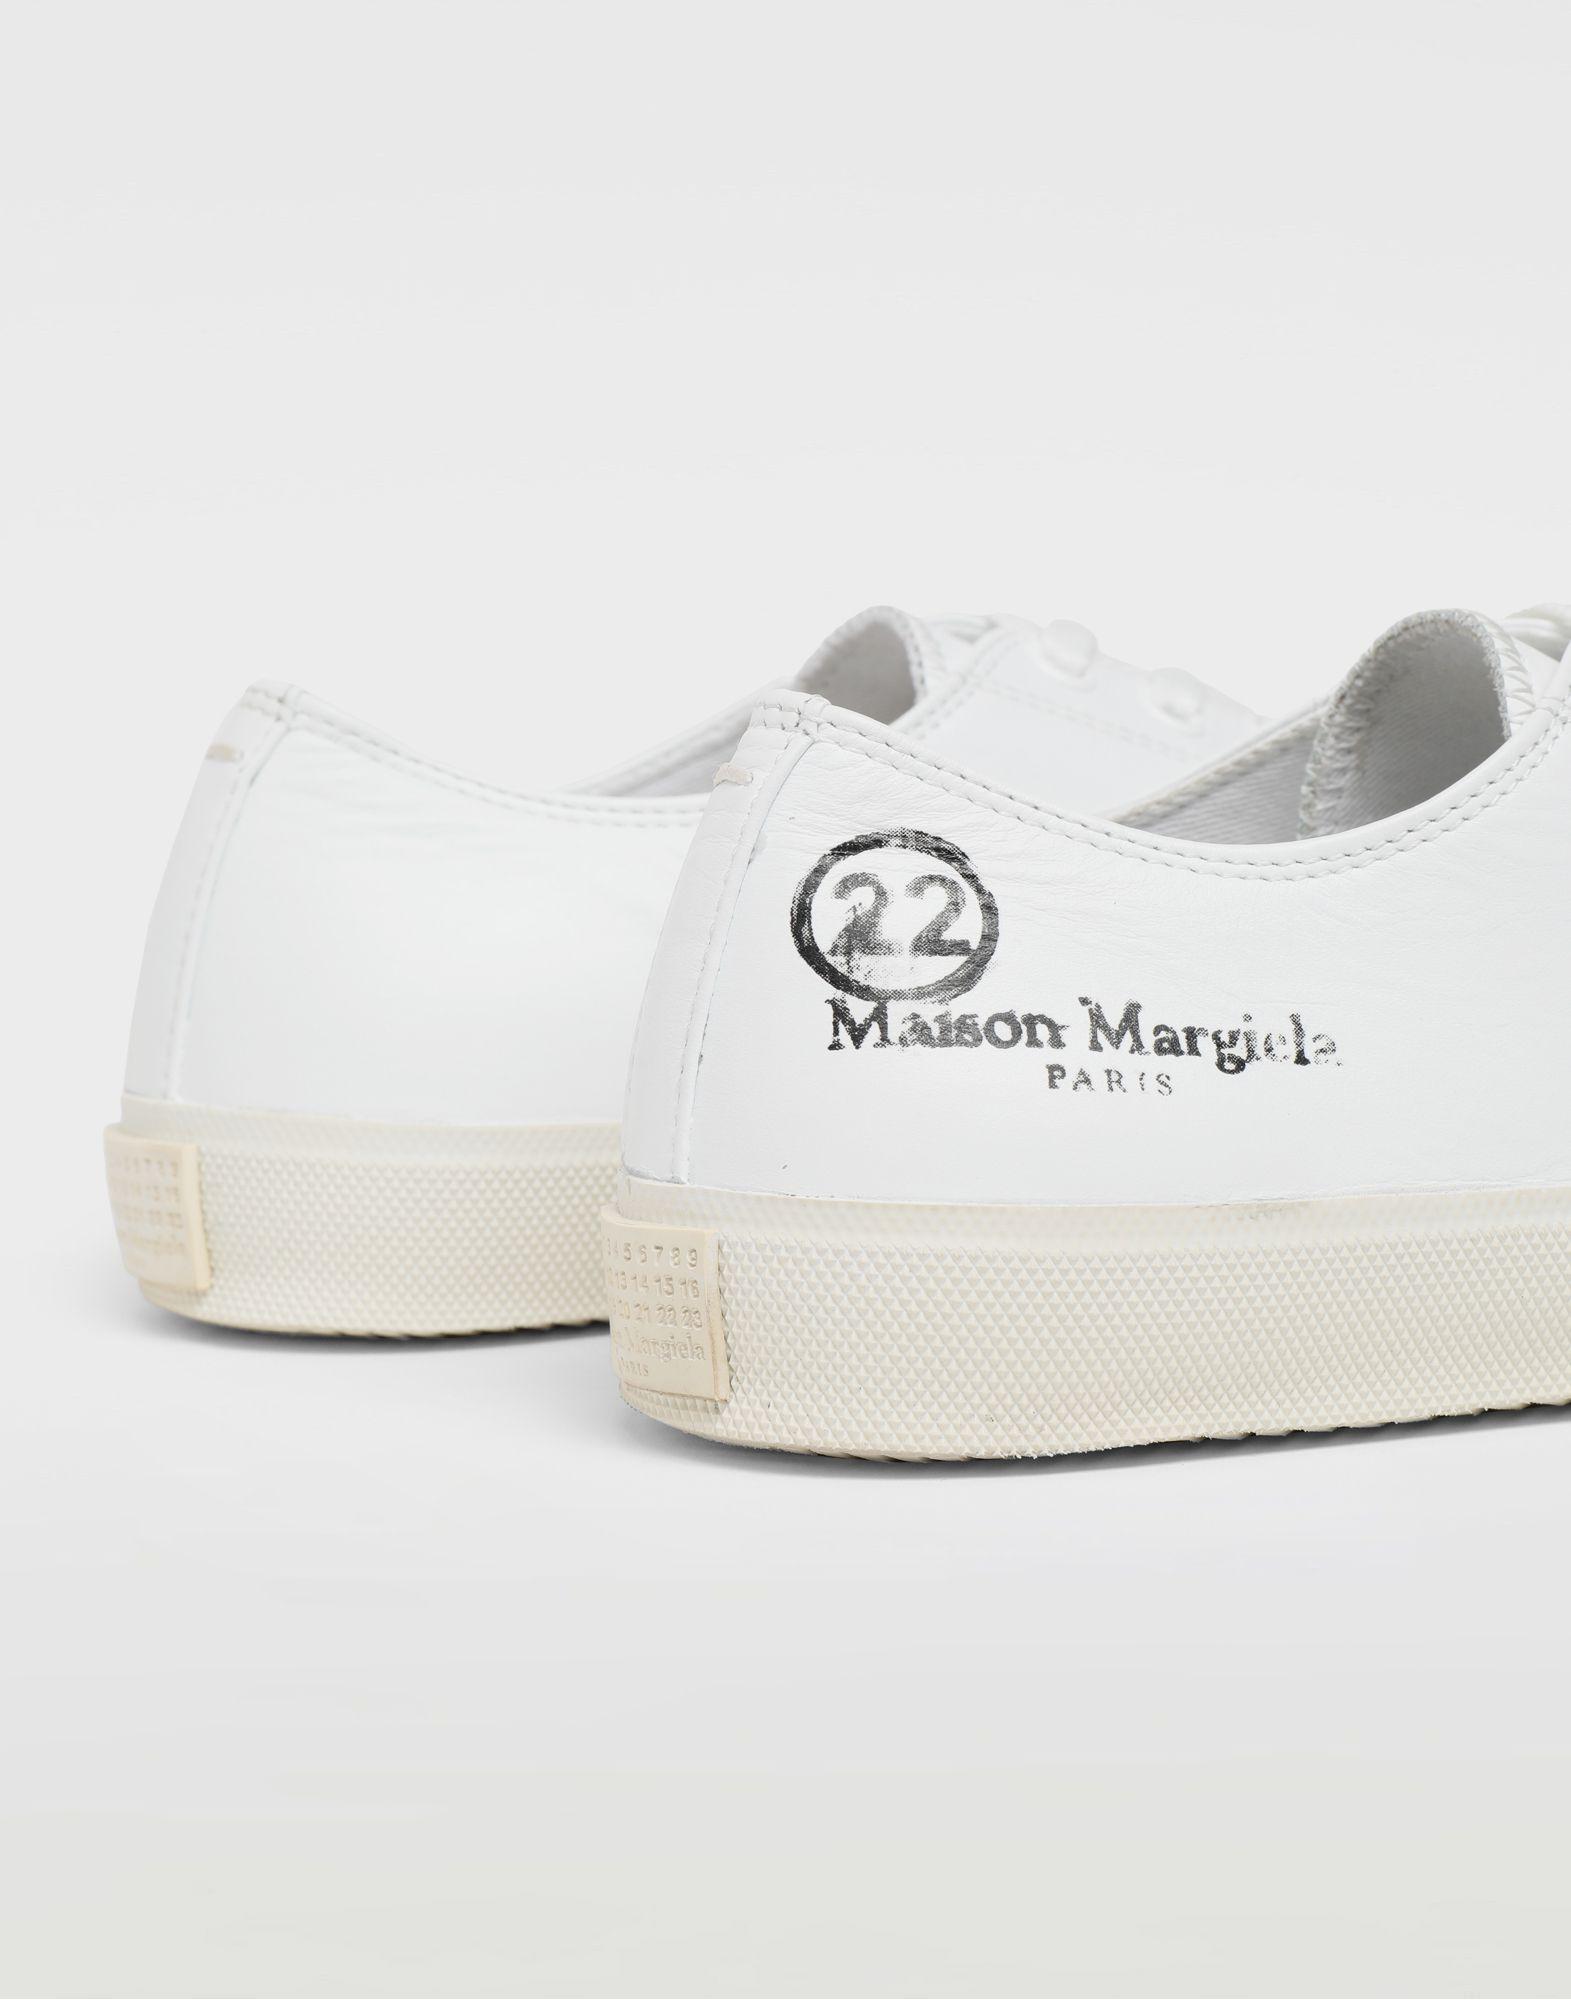 MAISON MARGIELA Tabi sneakers Sneakers Tabi Man b